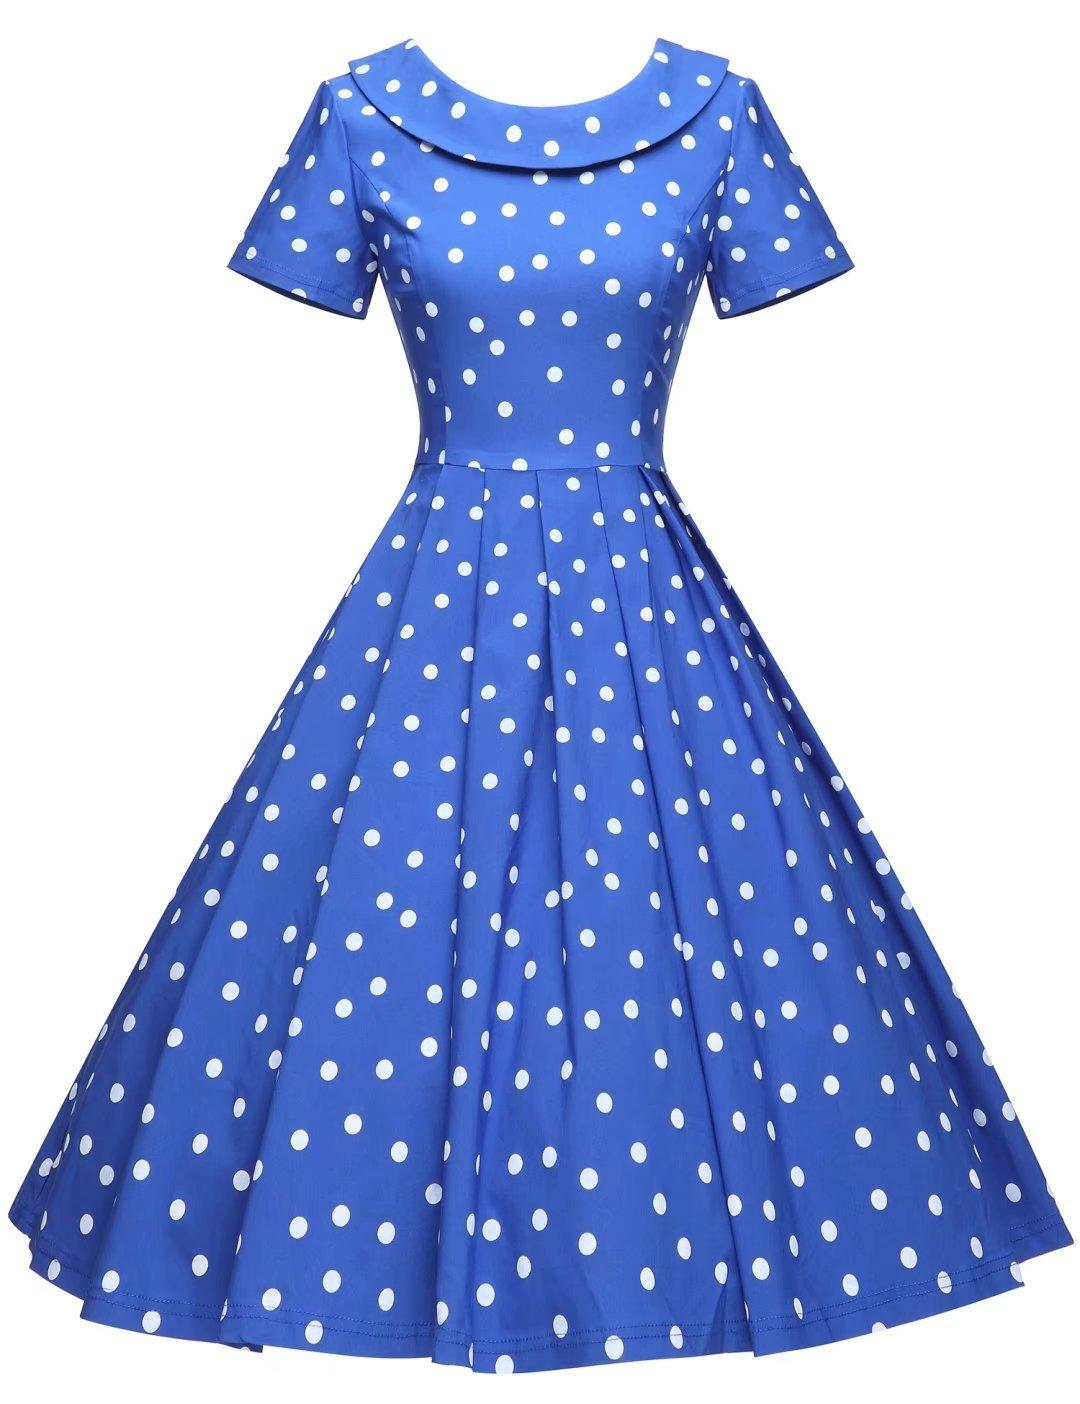 GownTown Women's 1950s Polka Dot Vintage Dresses Audrey Hepburn Style Party Dresses,Royal Blue,Medium